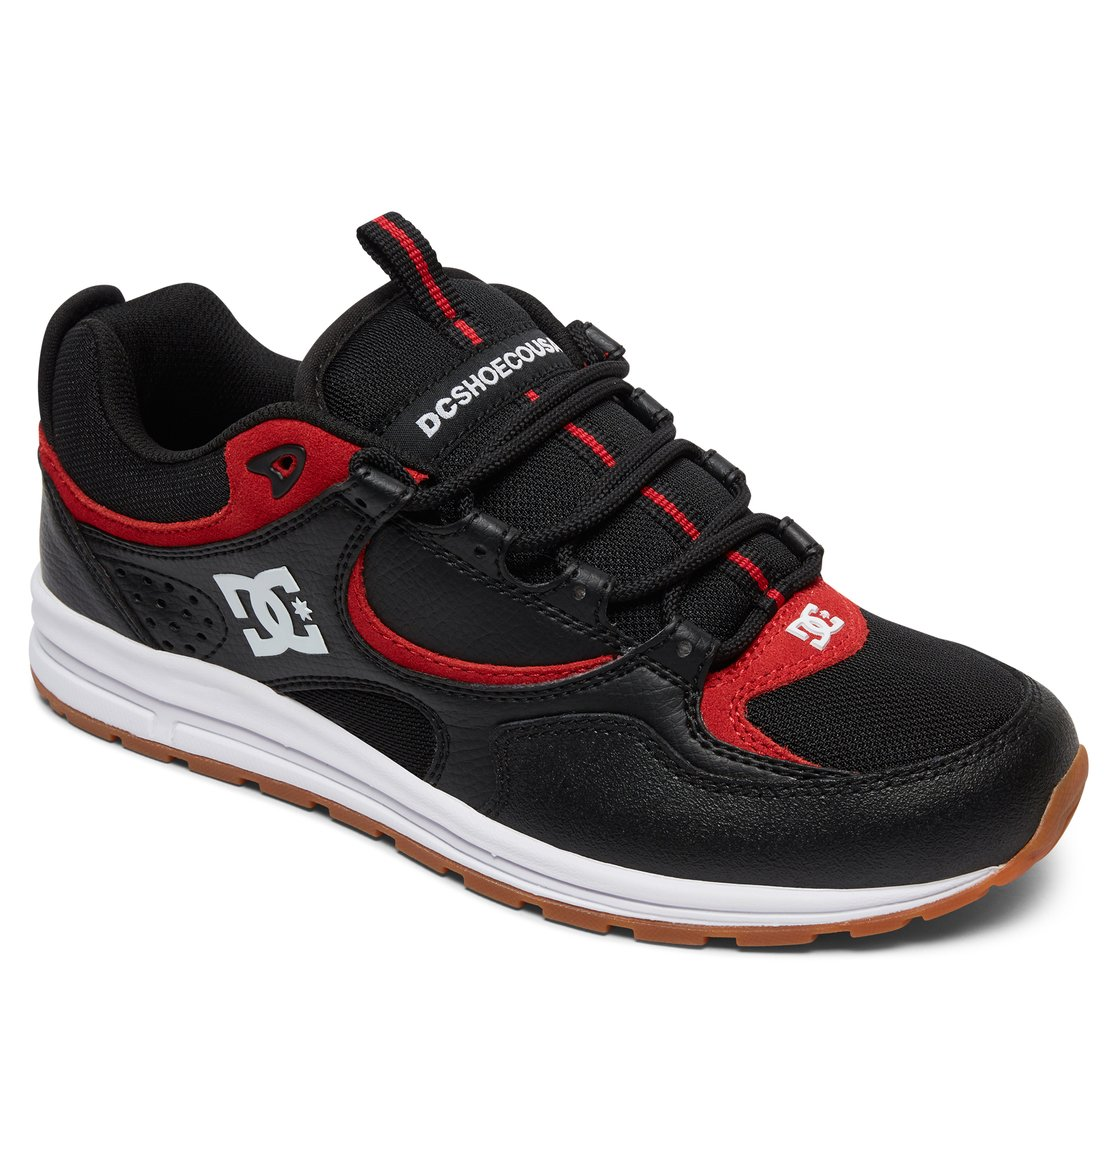 dc shoes Kalis Lite - Scarpe da Uomo - White - DC Shoes qRuqCRDPM